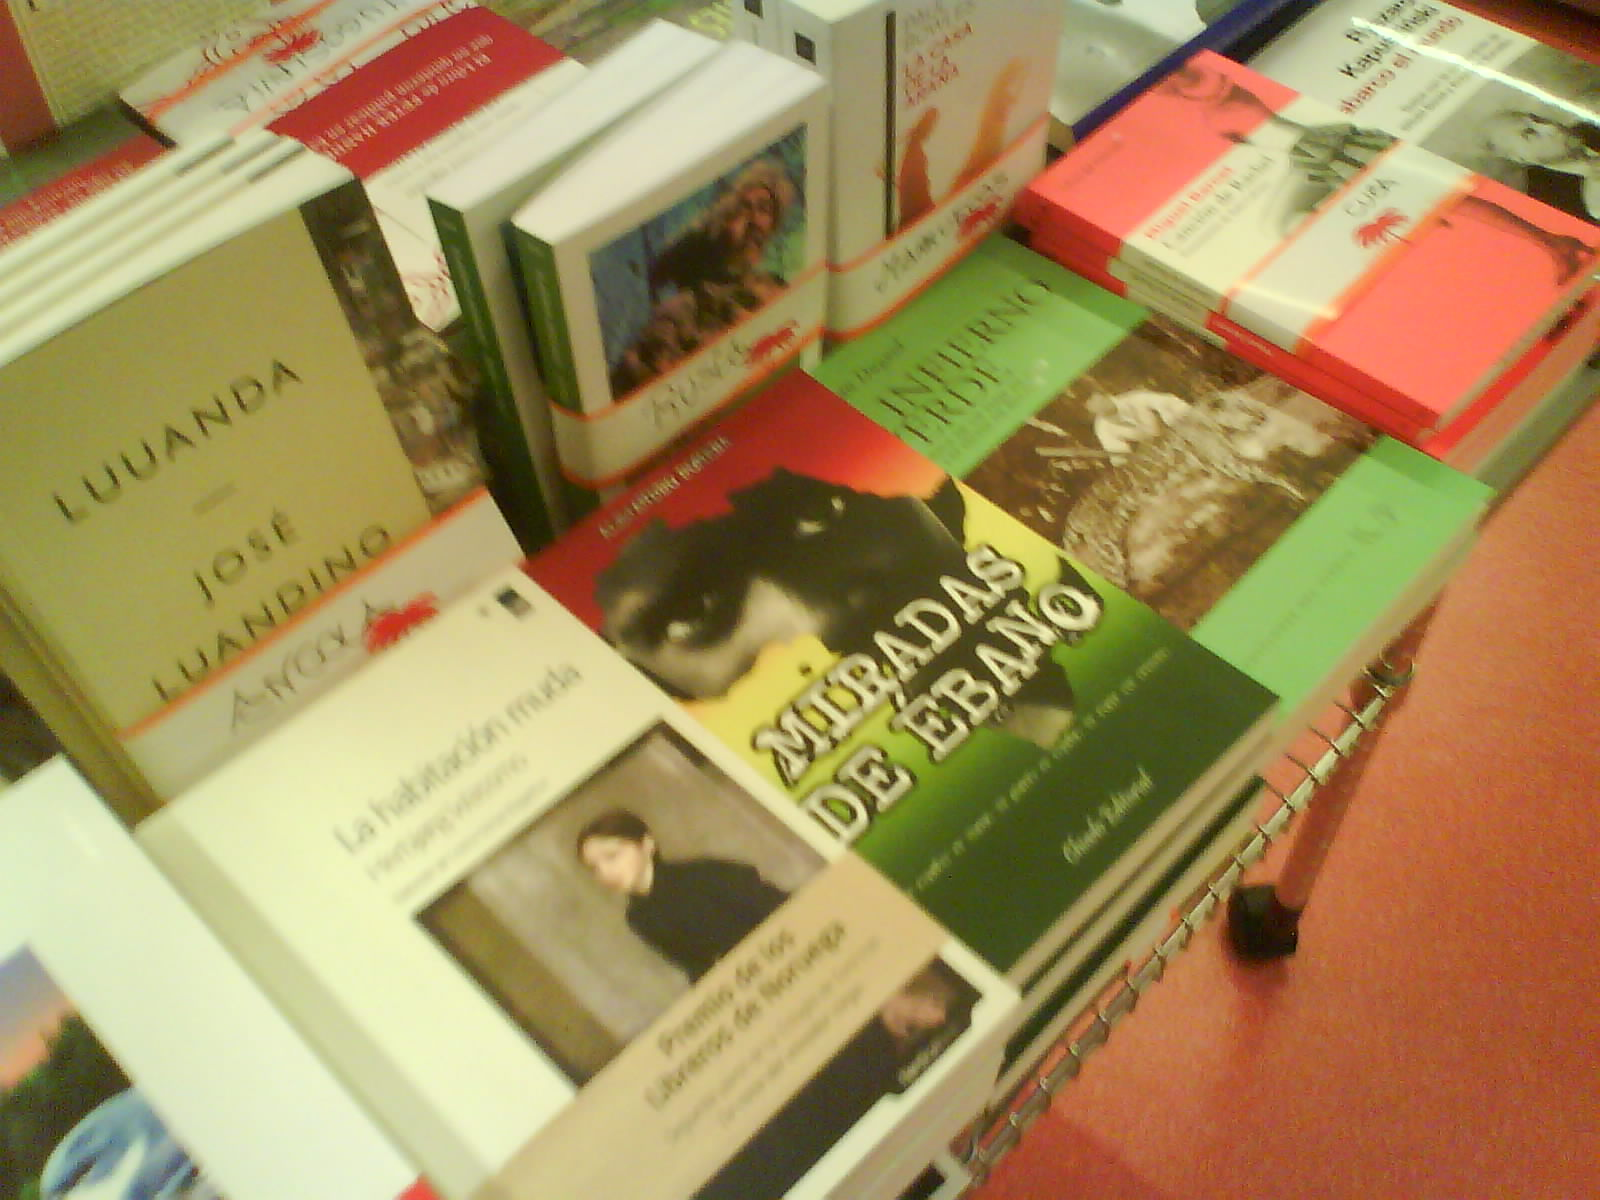 Miradas de ebano algunas librerias donde podeis encontrar - Libreria desnivel barcelona ...